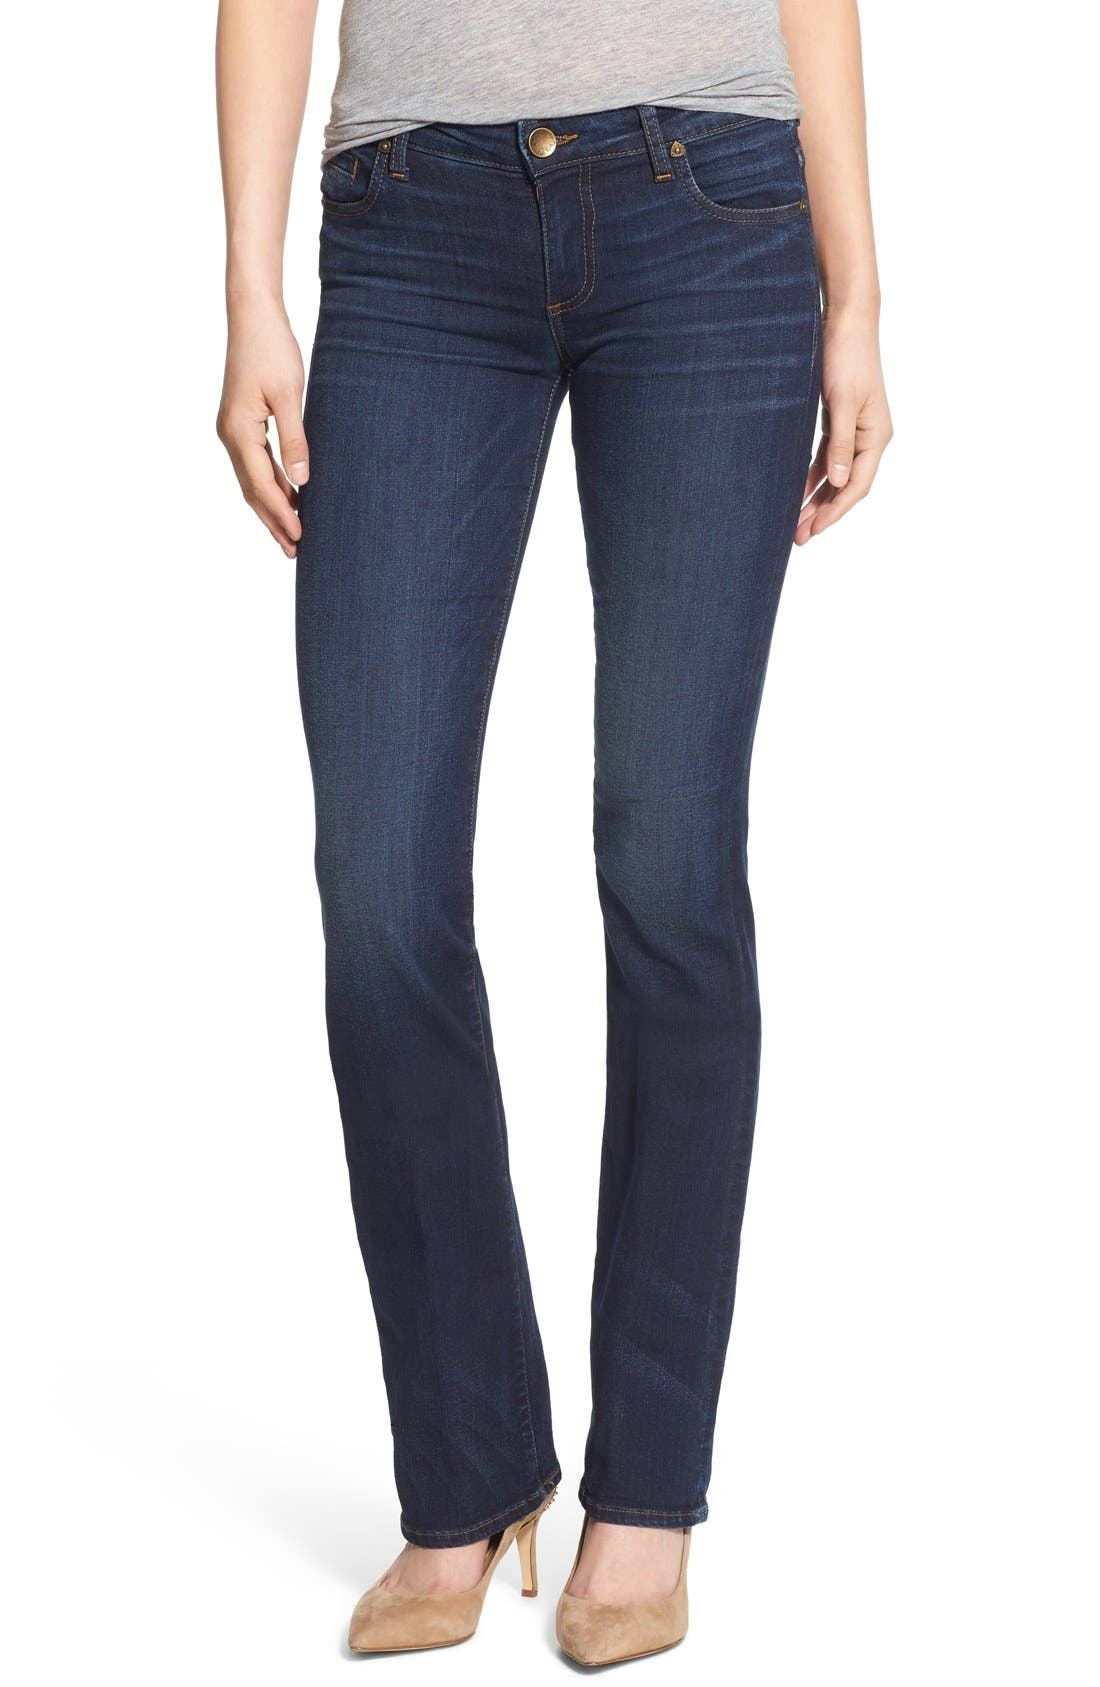 'Natalie' Stretch Bootleg Jeans,                             Main thumbnail 1, color,                             401